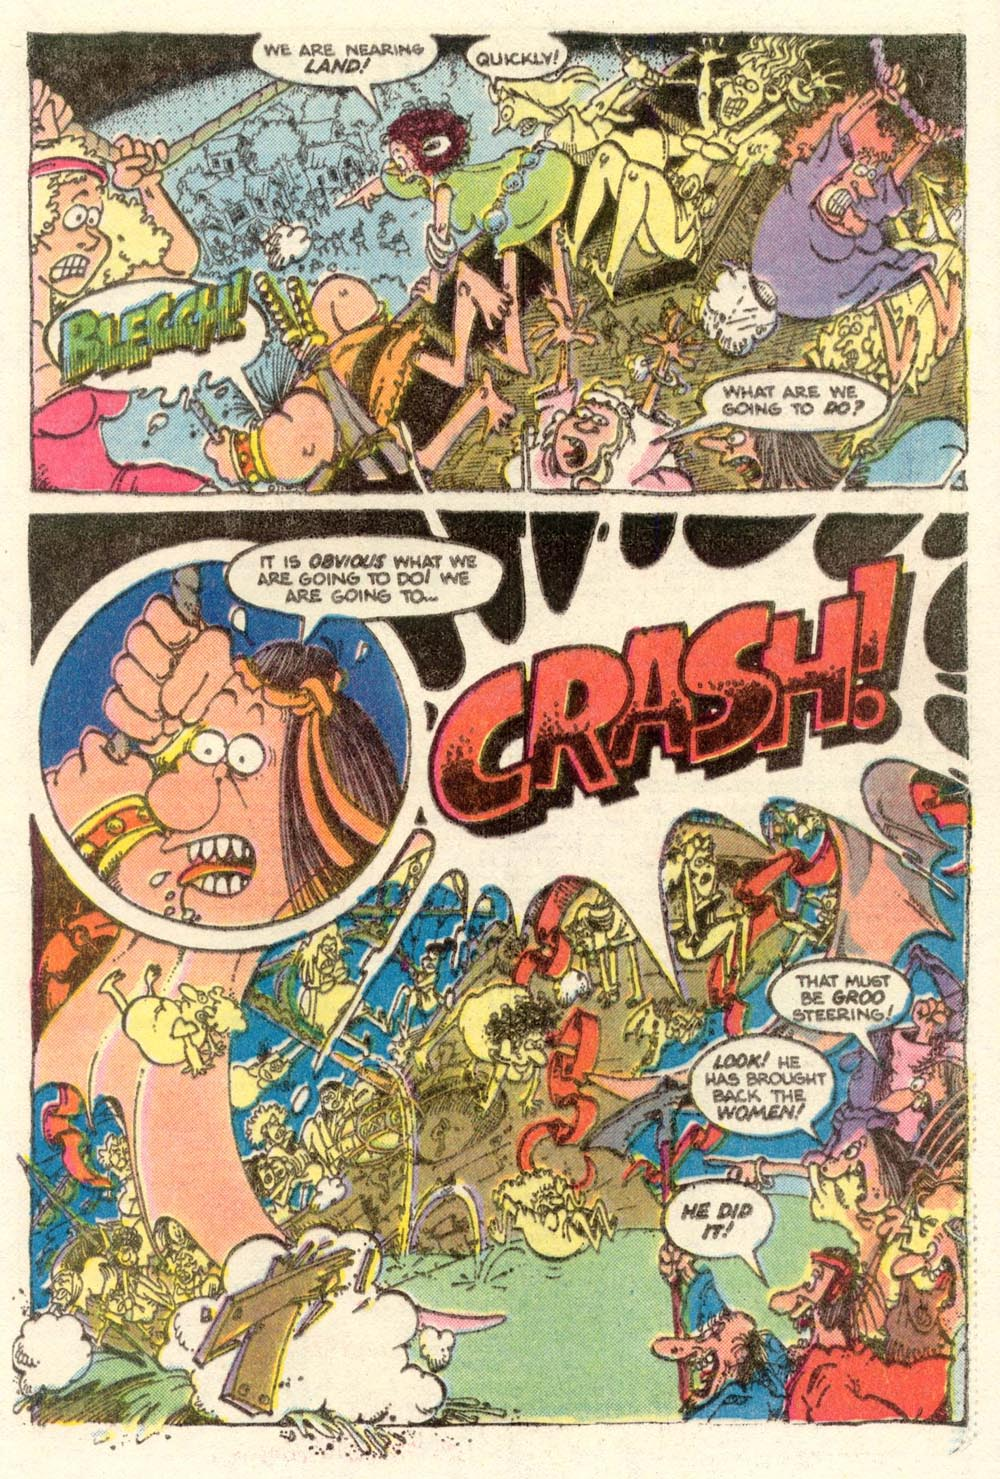 Read online Sergio Aragonés Groo the Wanderer comic -  Issue #4 - 20